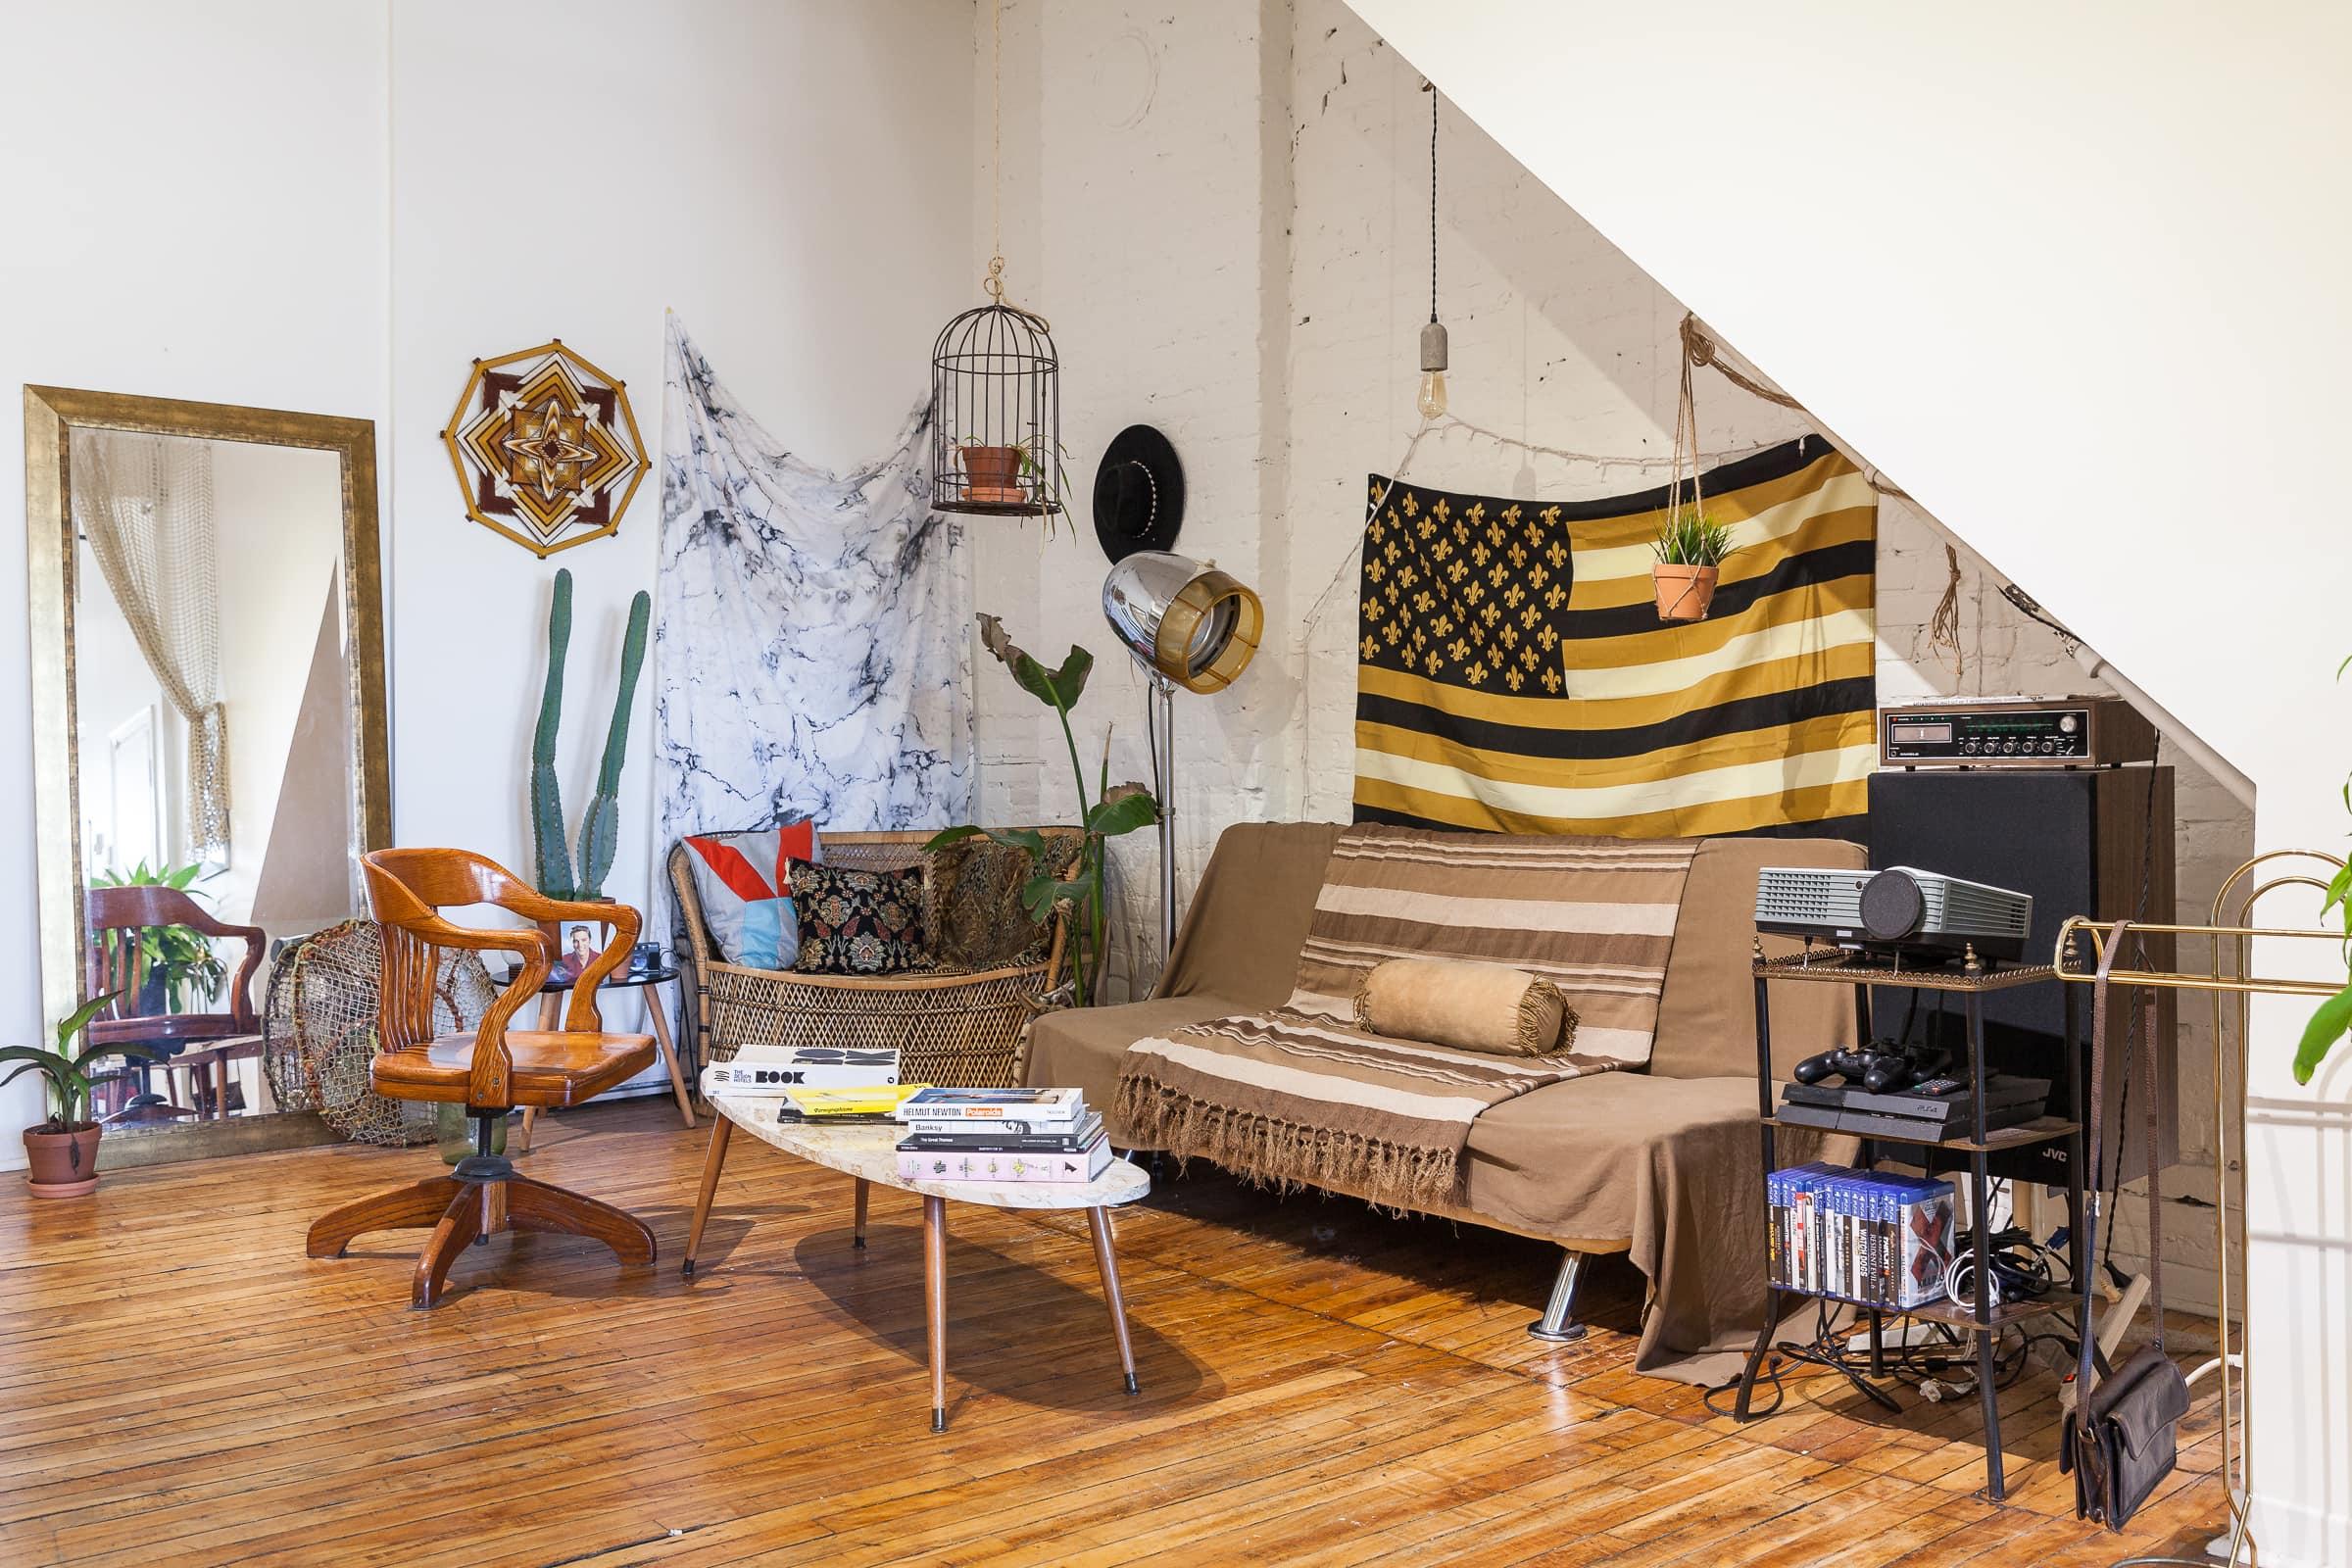 House Tour: A Bohemian Montreal Loft | Apartment Therapy